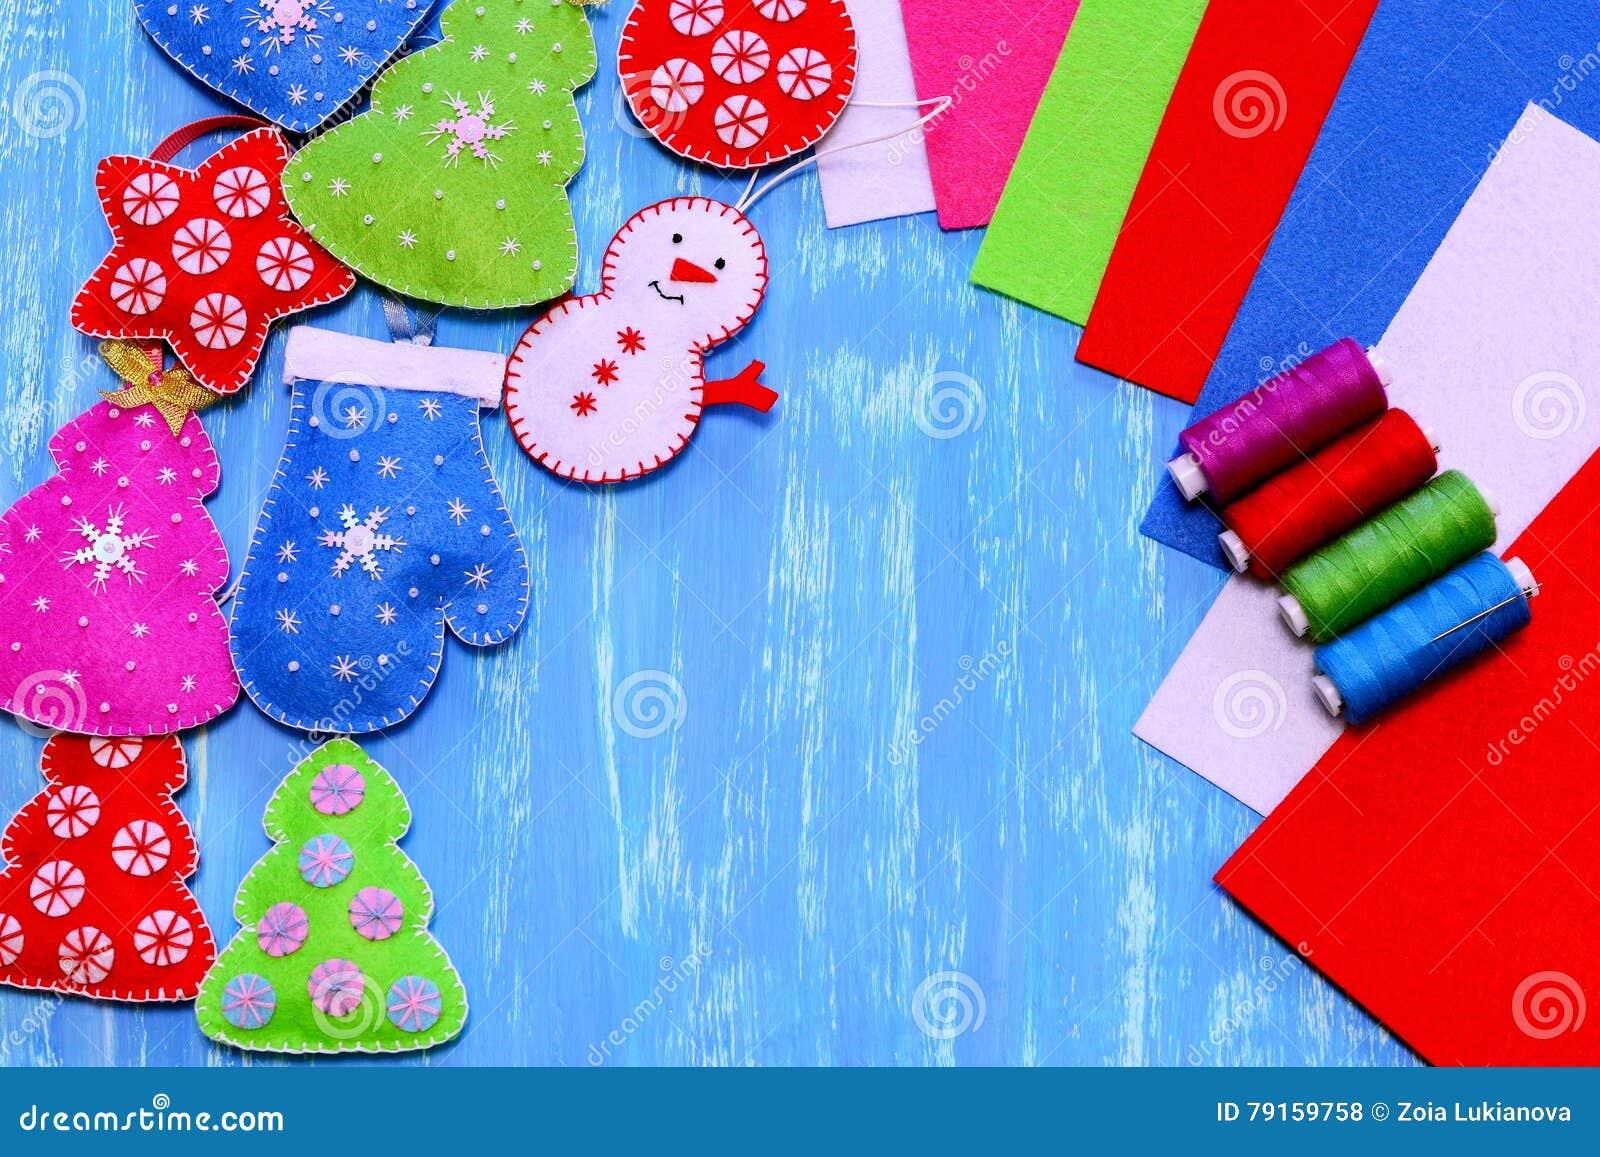 Mitten christmas decorations - Ball Christmas Colorful Crafts Decorations Felt Heart Kids Mitten